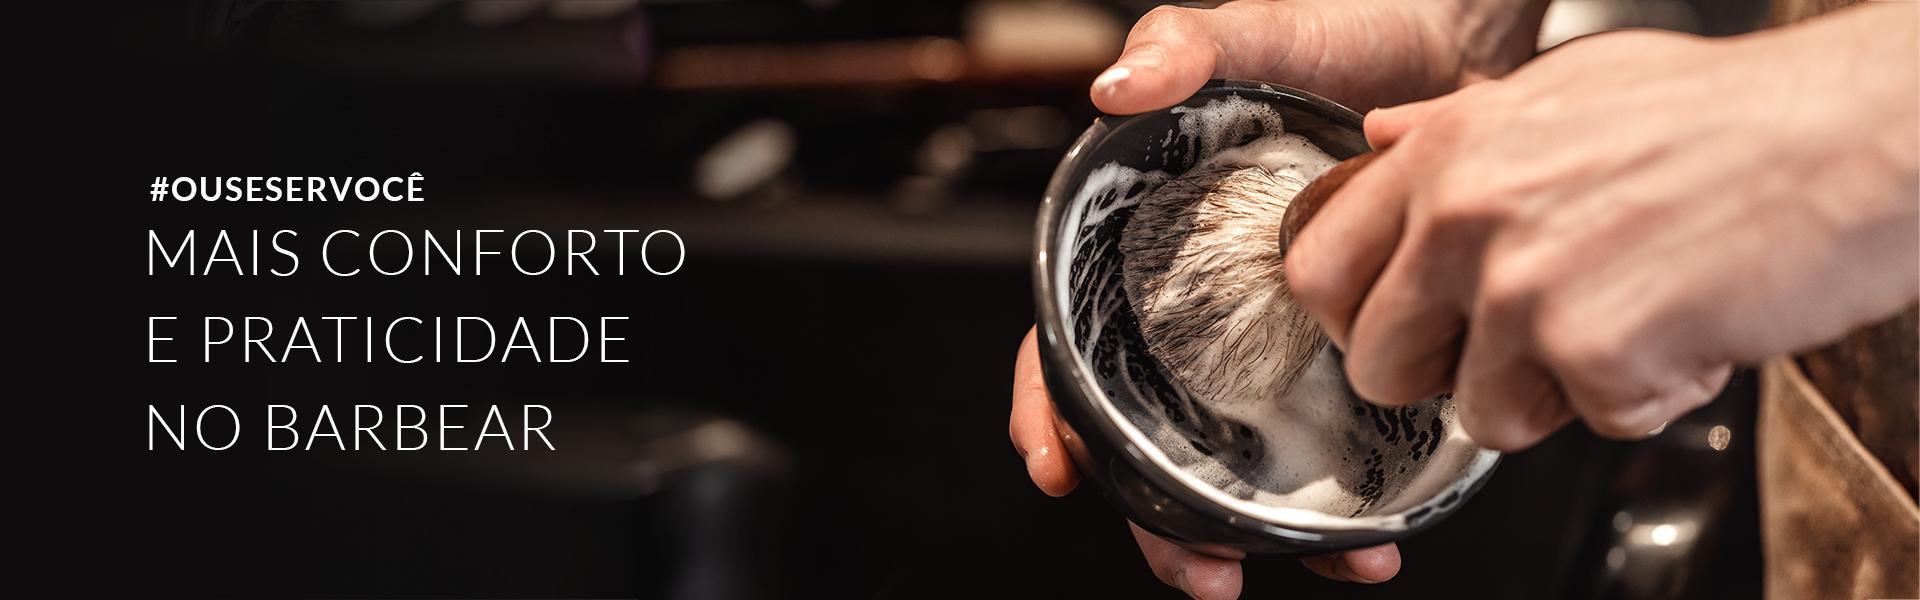 Produtos para barbear, creme de barbear, gel de barbear, loção pós-barba, gel pós-barba